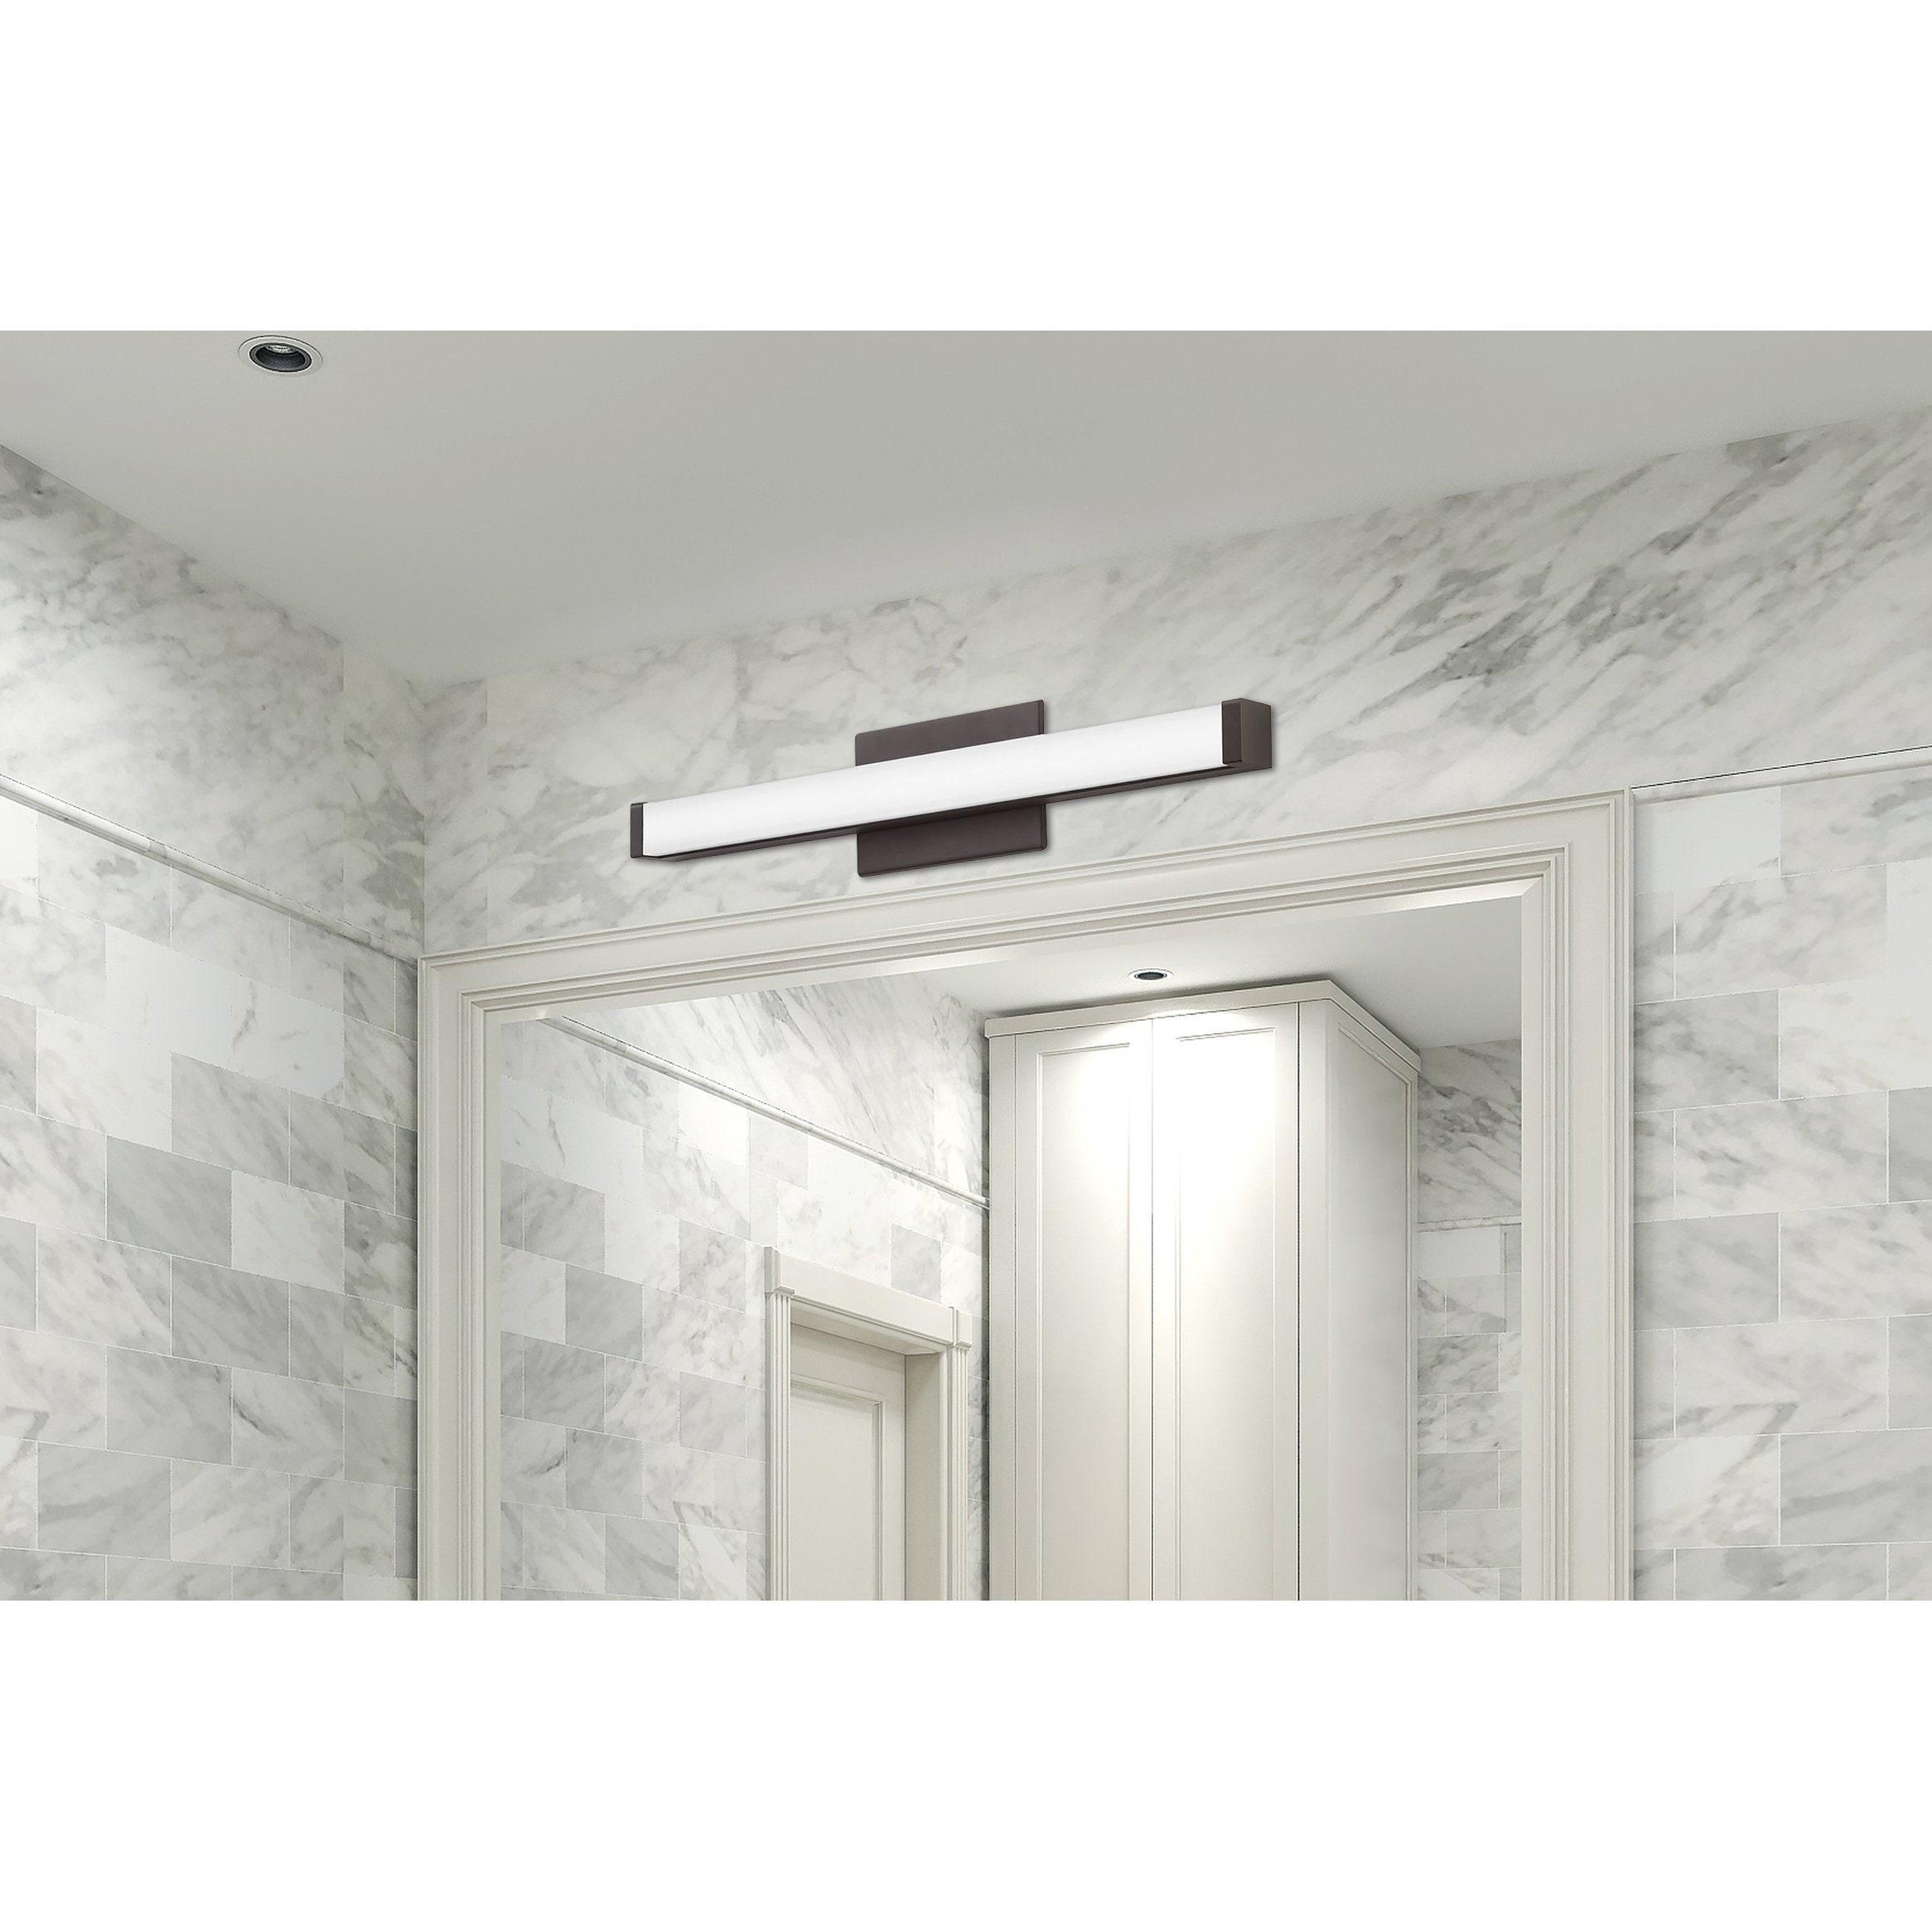 flushmount integrated pir indoor lighting garage sgll p lithonia black light lights motion ft led sensor with